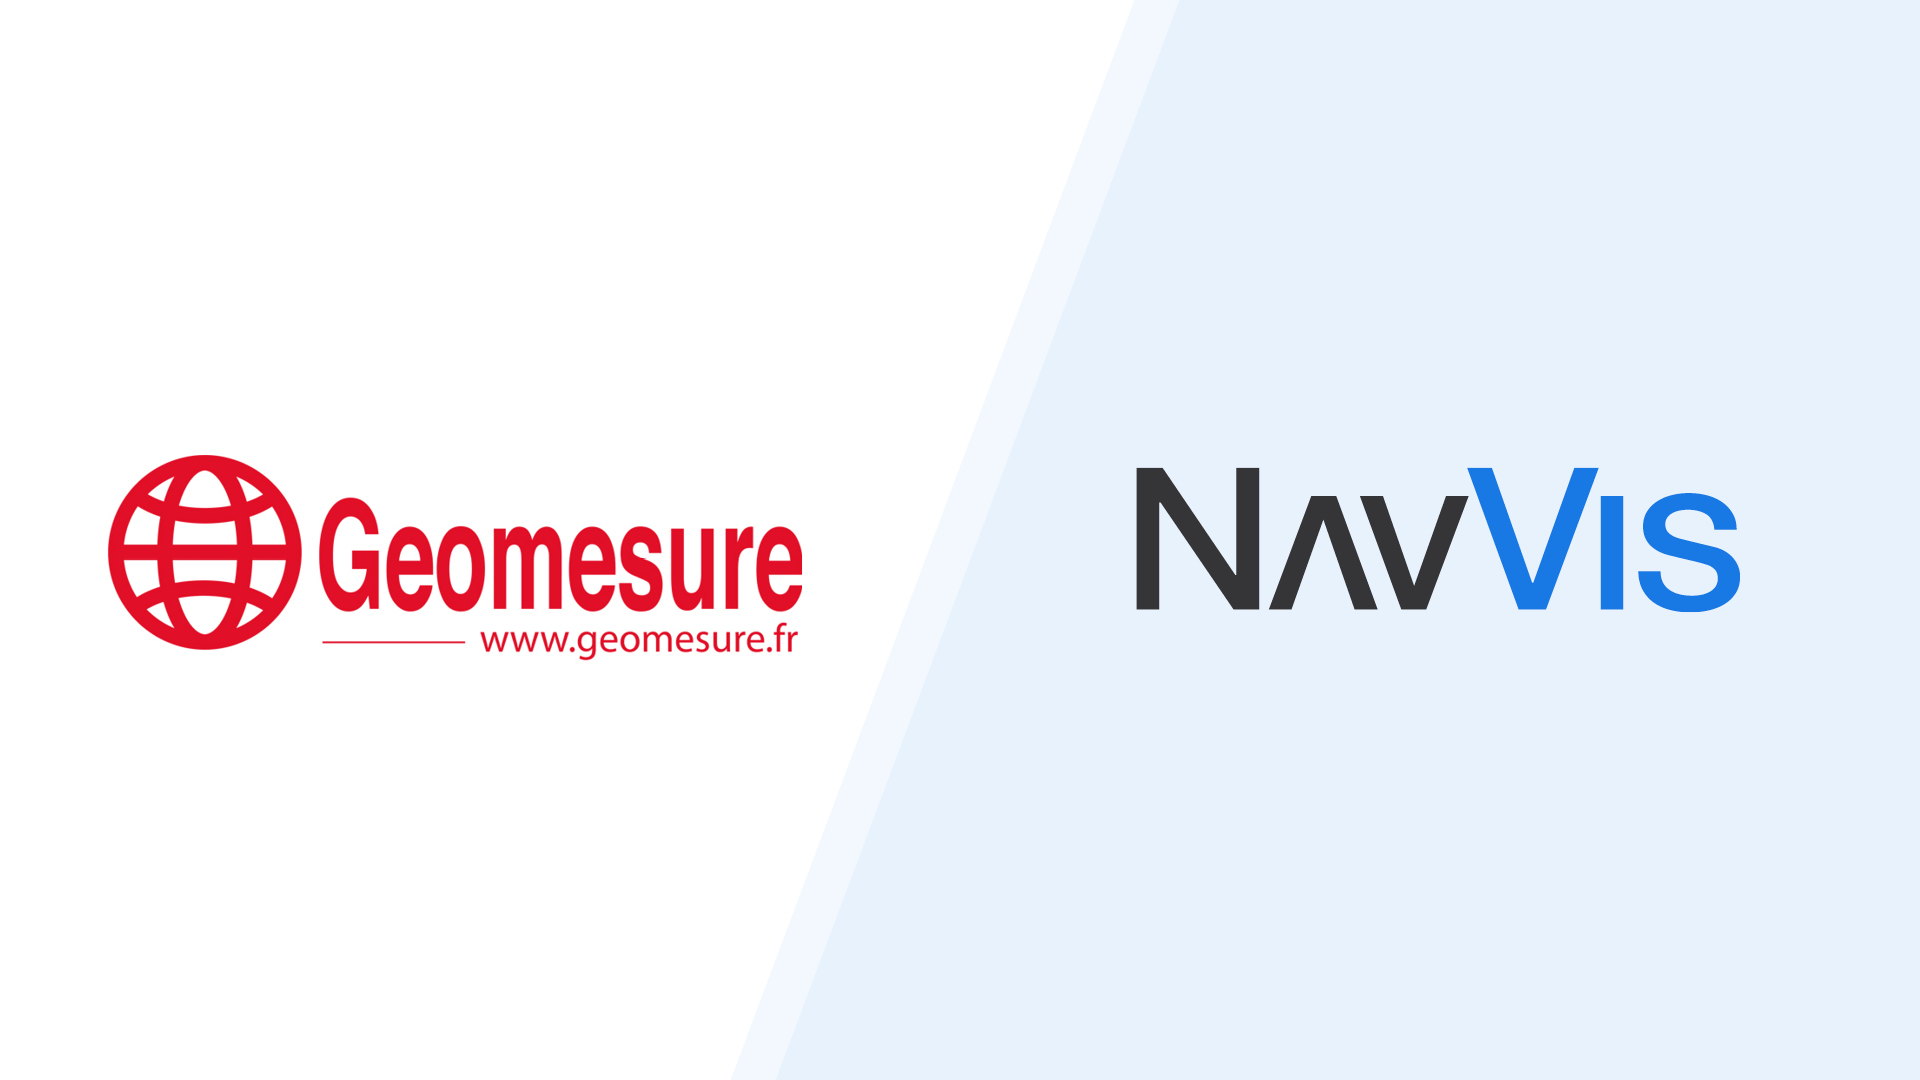 geomesure-navvis-logo